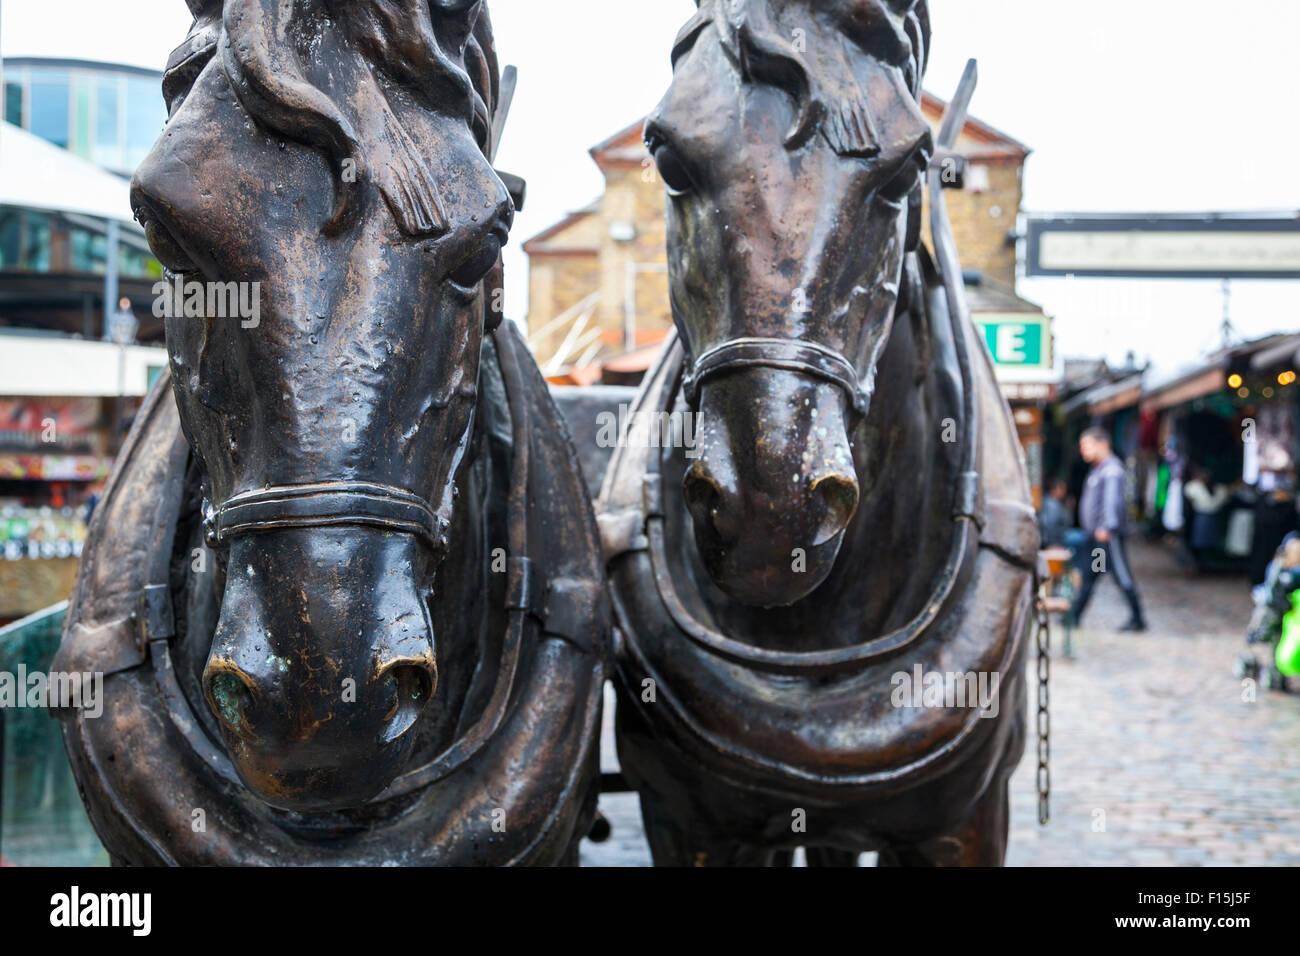 Horse sculptures in Camden Stables Market, London, UK - Stock Image